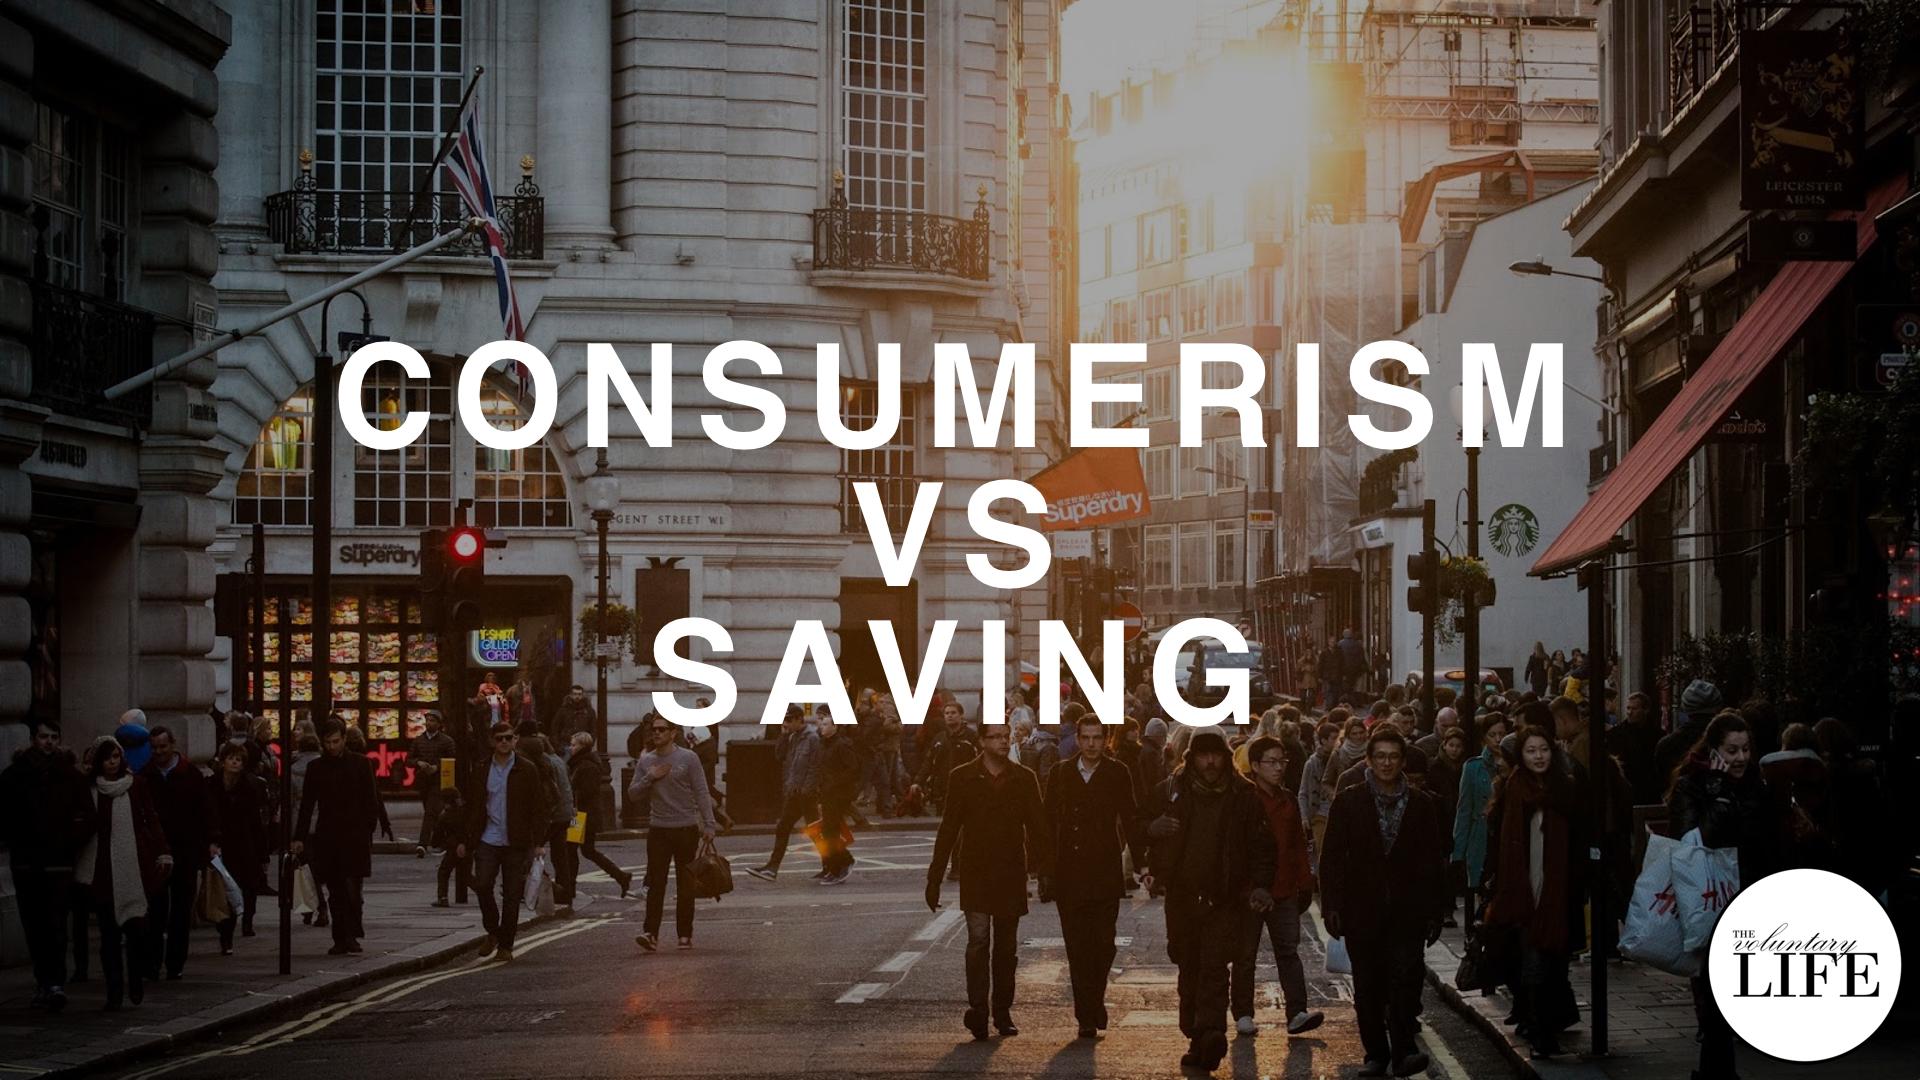 267 Consumerism Vs Saving: Four Theories